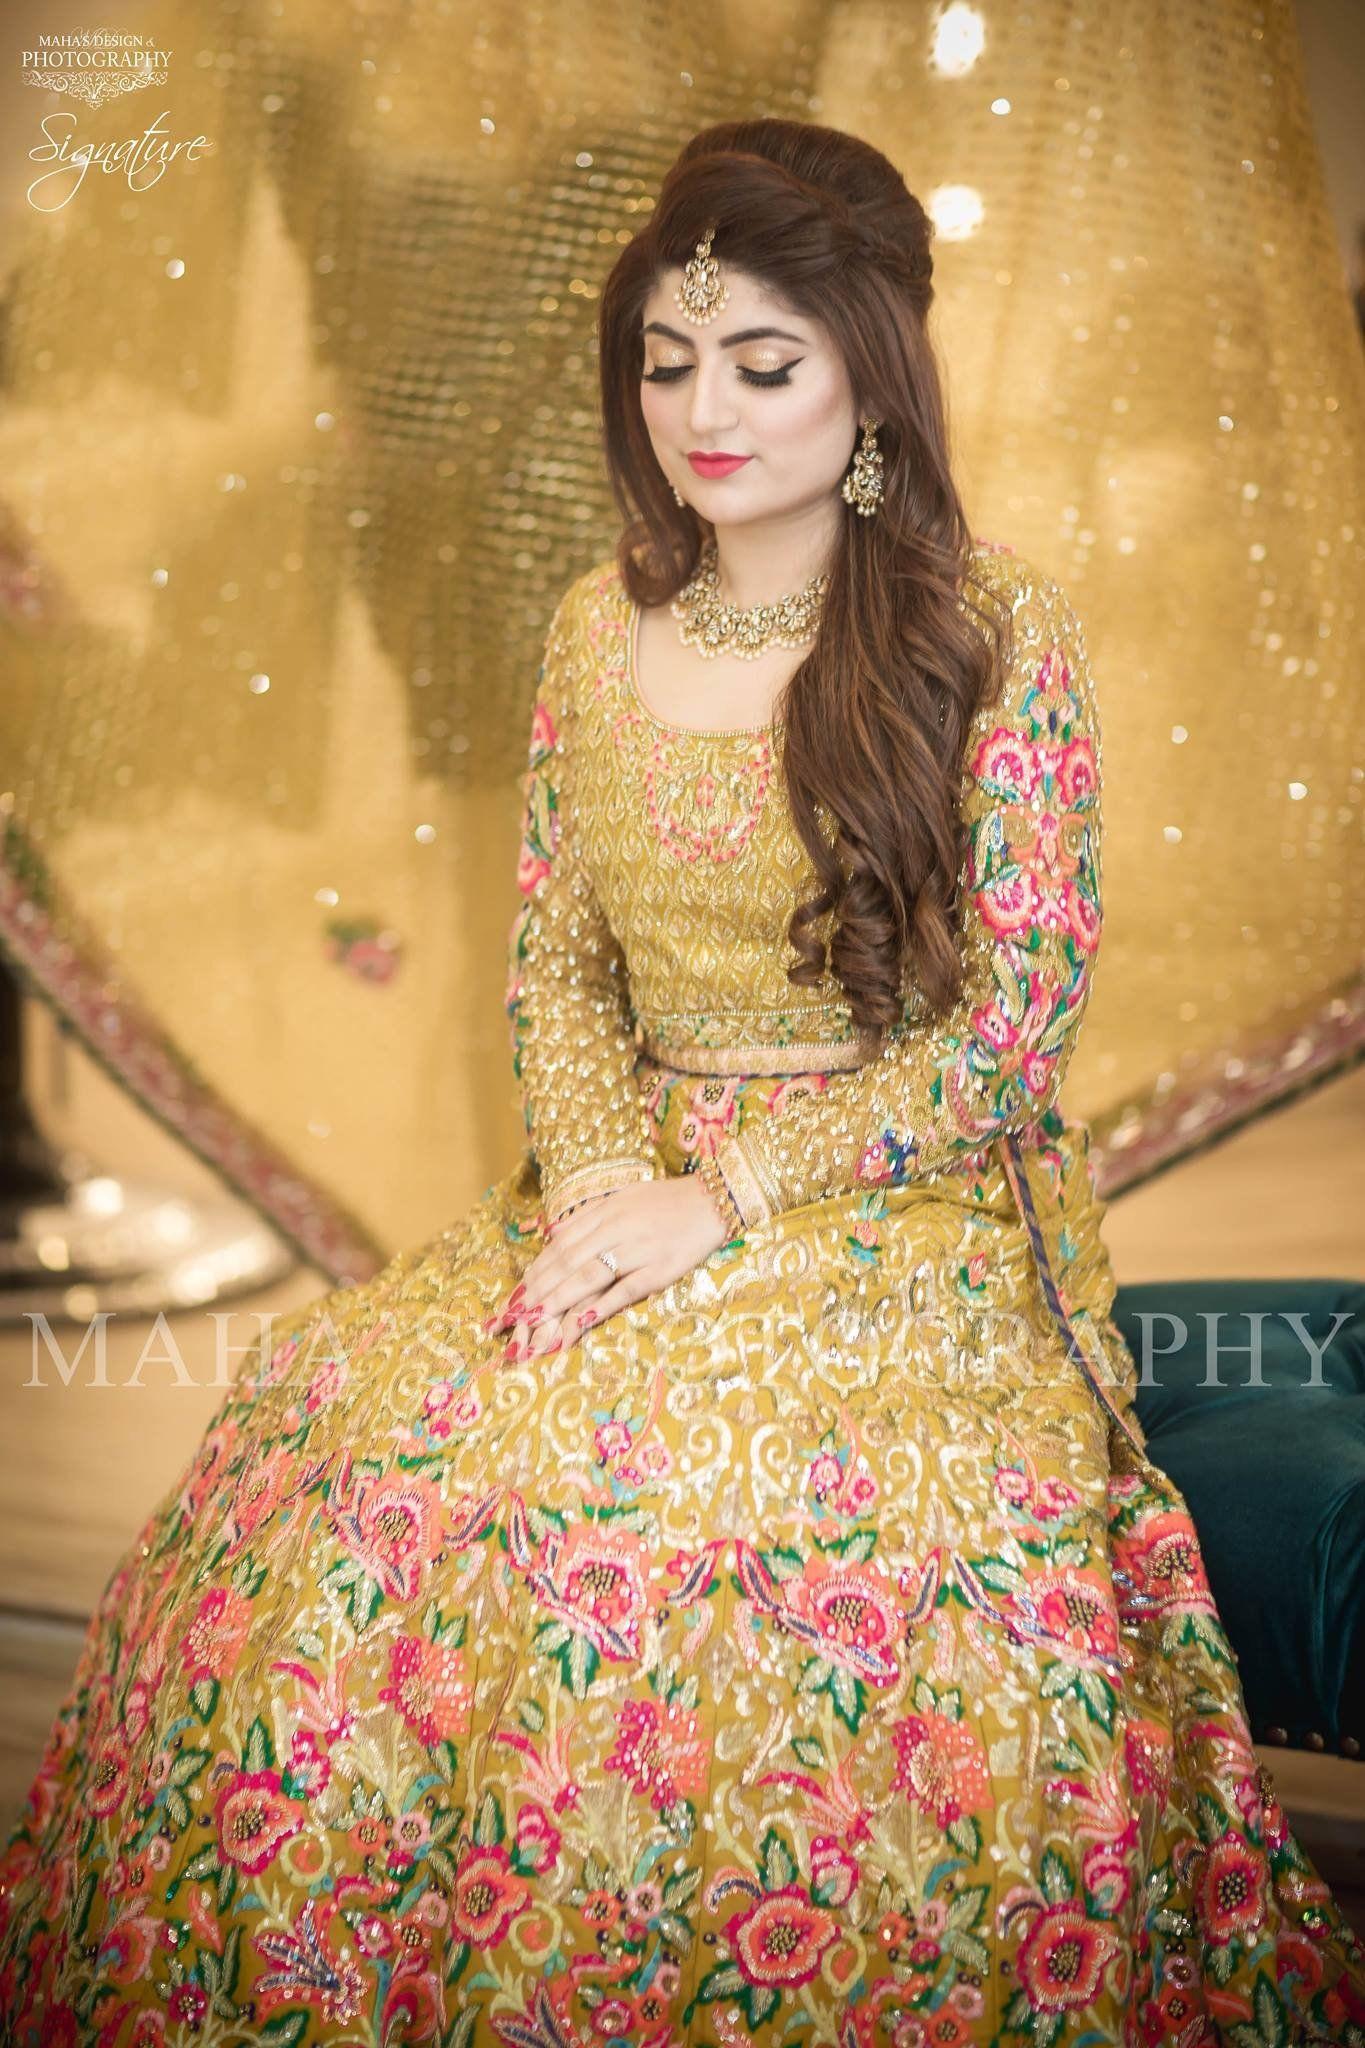 Beutifull bridal Mahndi lahnga in light mehndi color Model